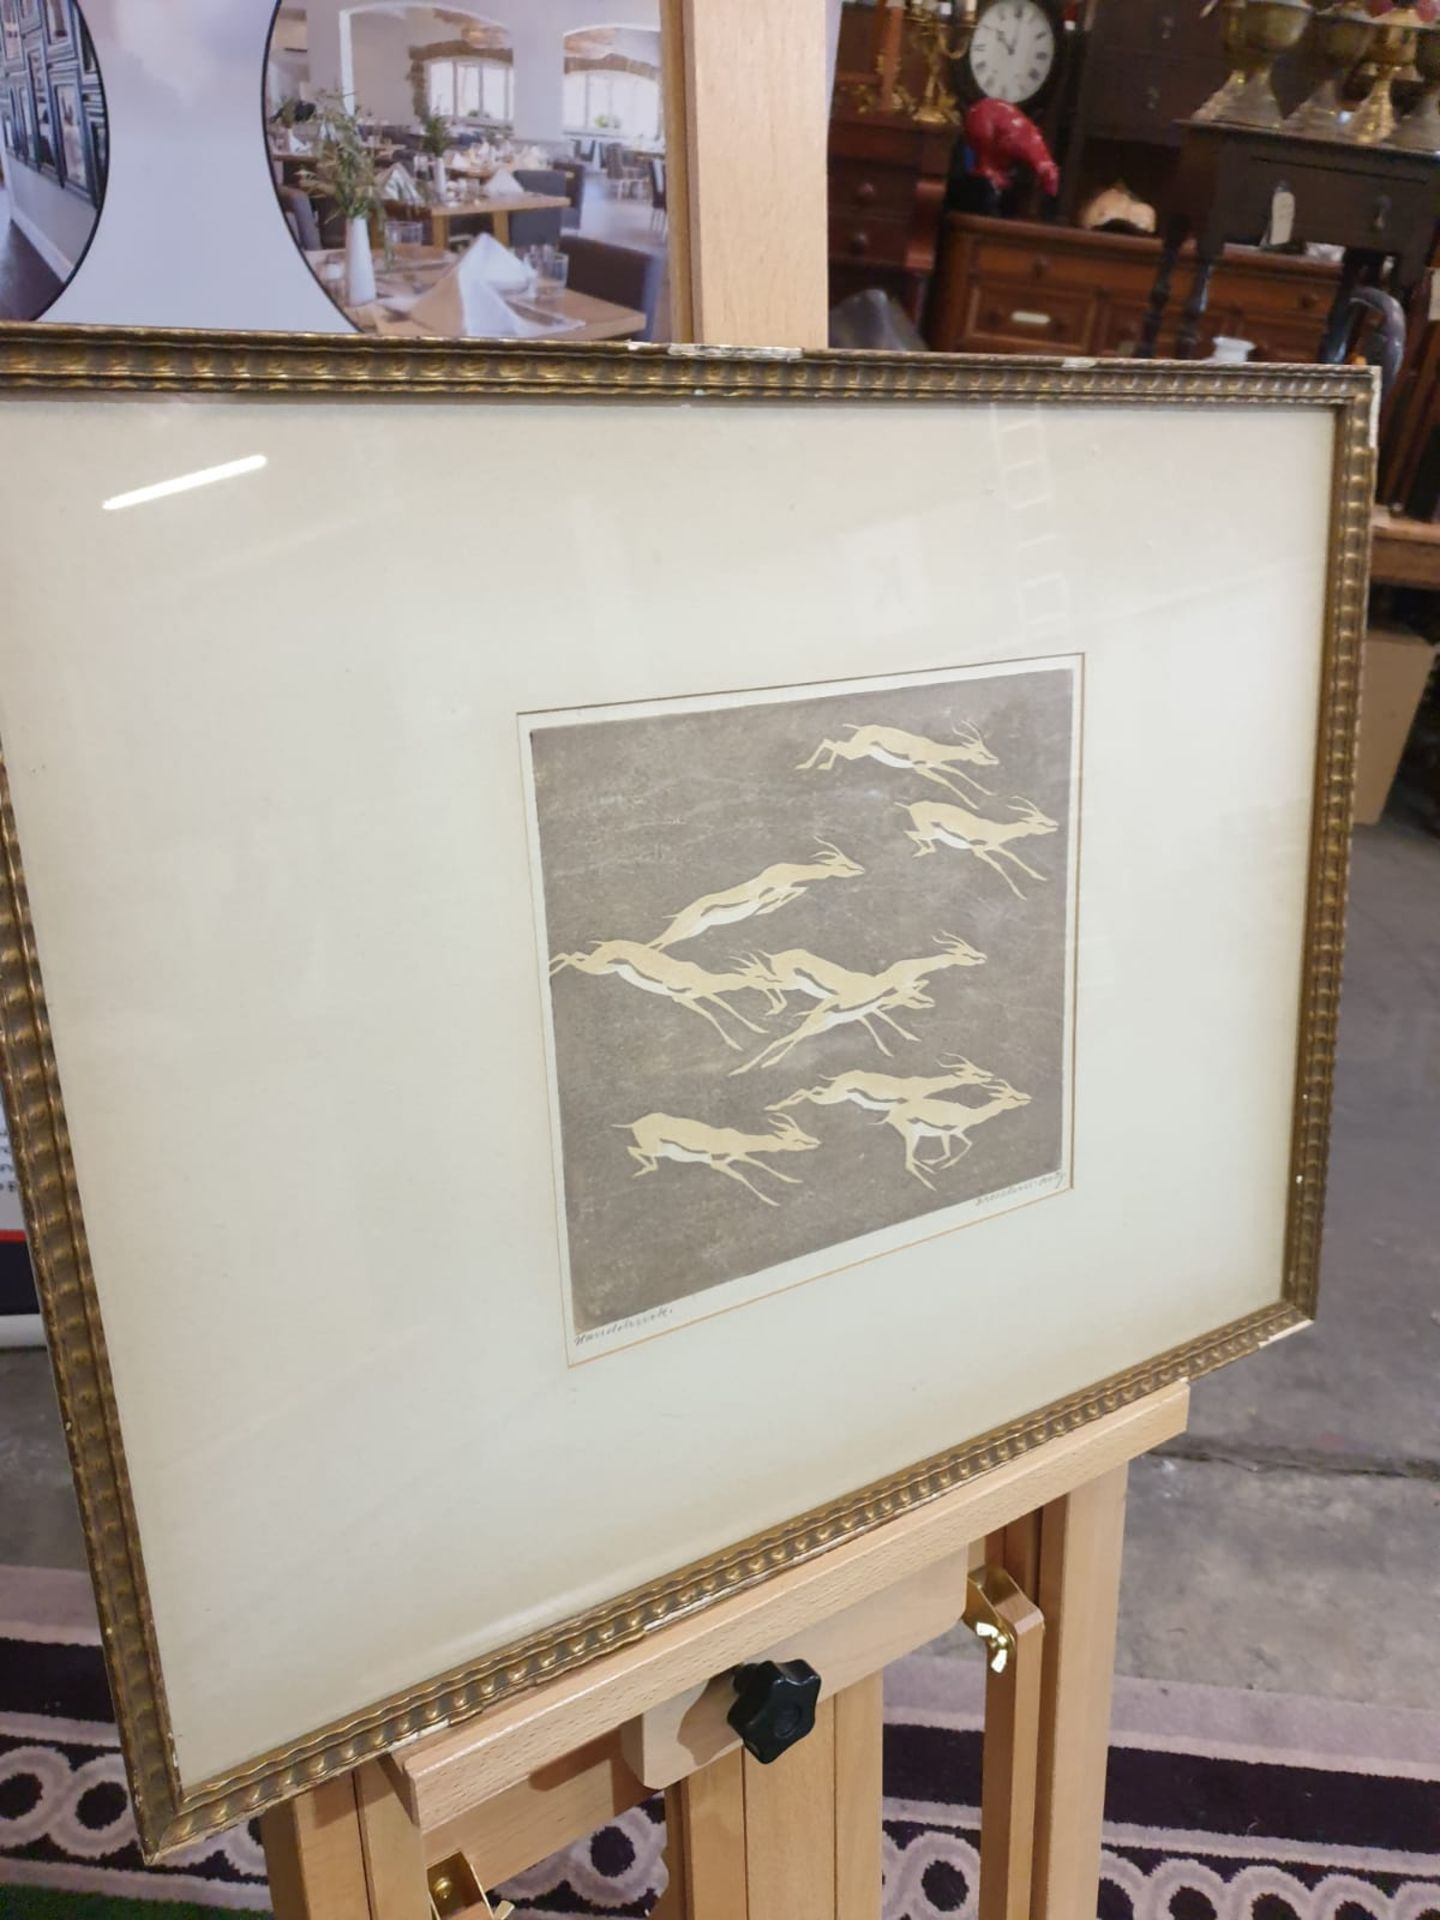 Line cut print multiple by Von Bresslern - Roth 1891-1978 Gazelles c. Circa 1920 Height 55 cm; - Image 3 of 5